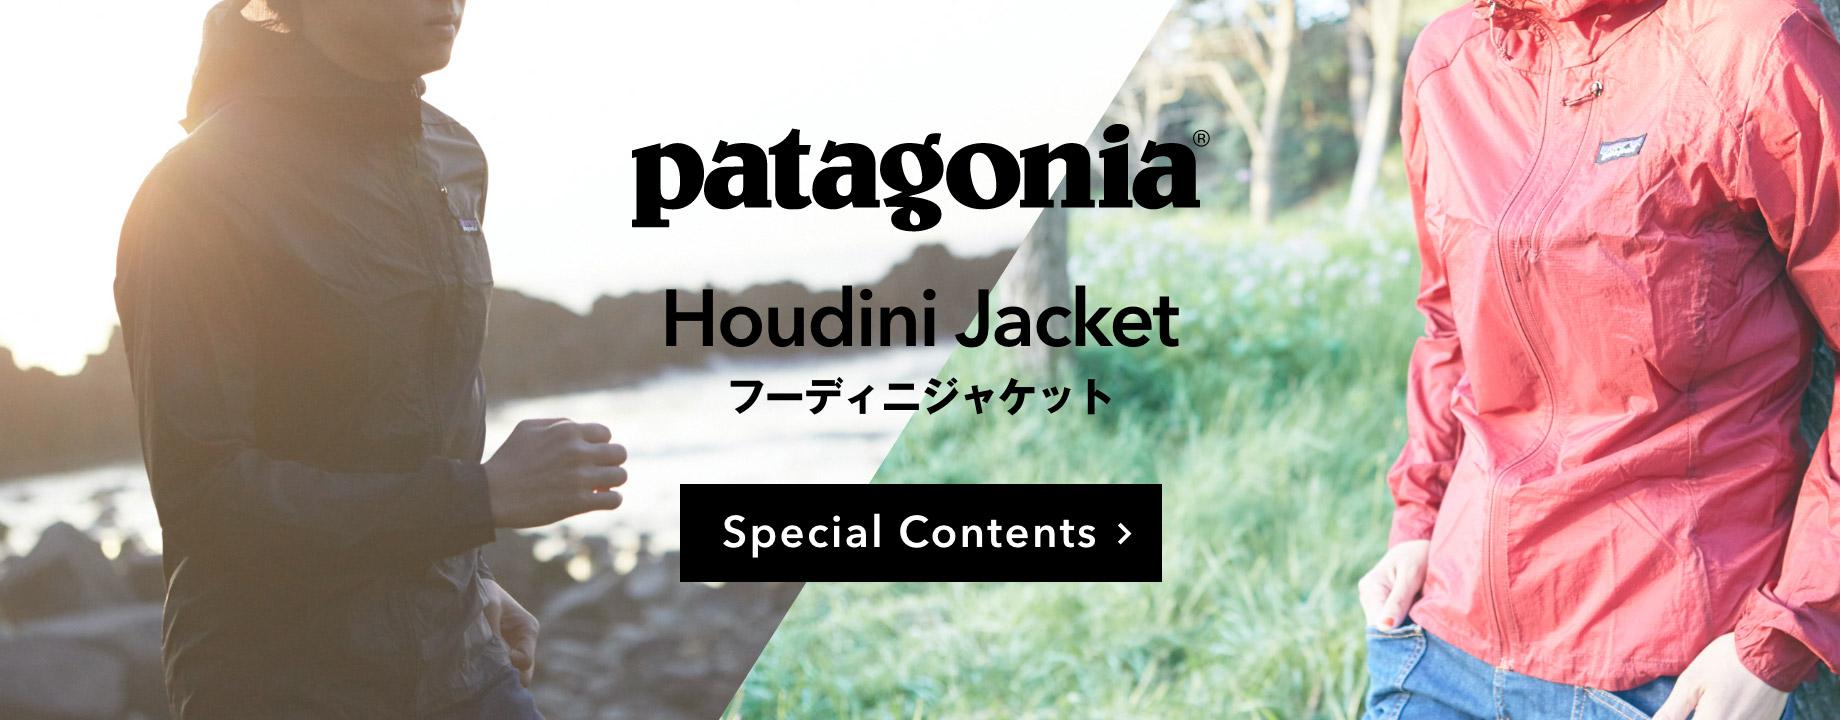 patagonia パタゴニア フーディニジャケット特集